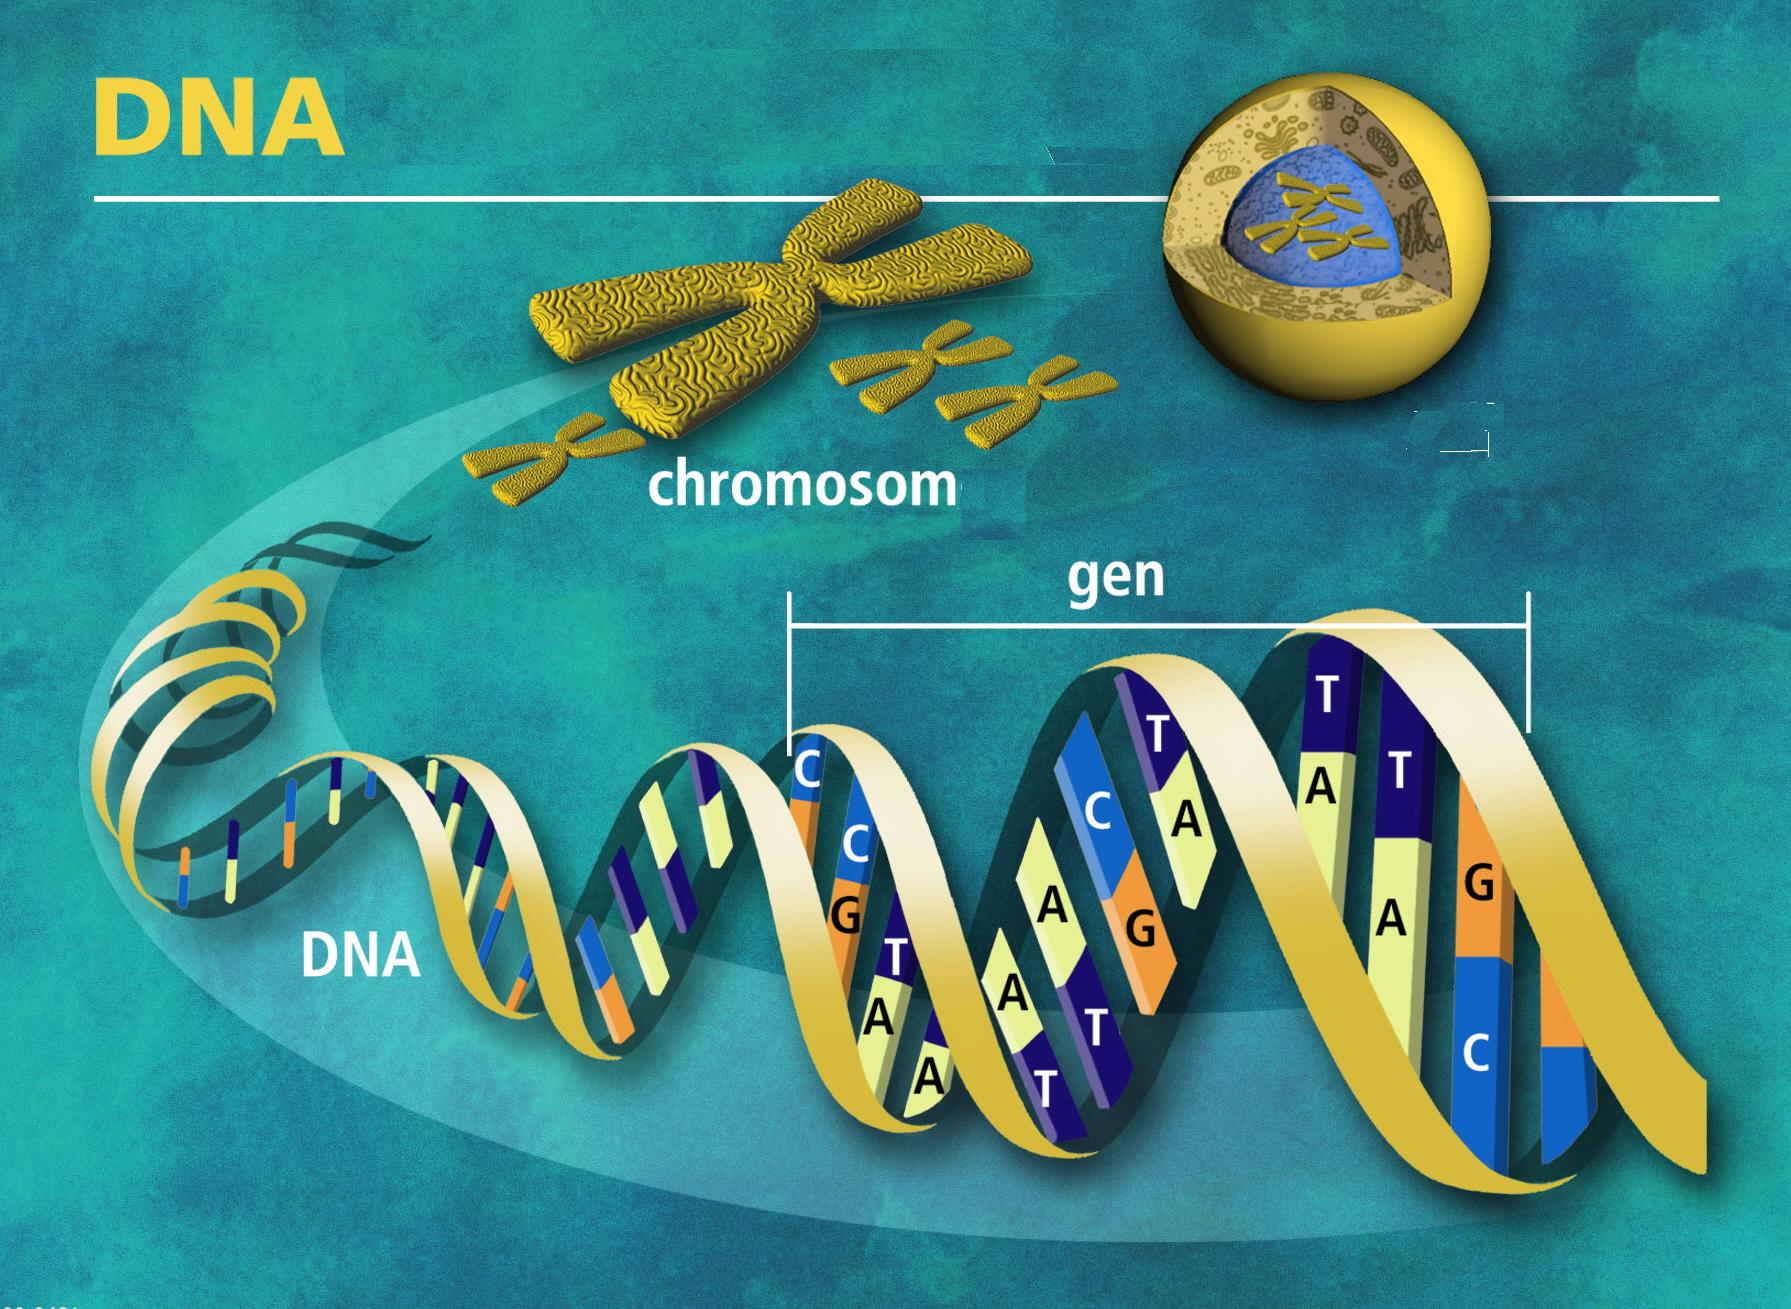 Molécula de DNA. Fuente: Wikimedia